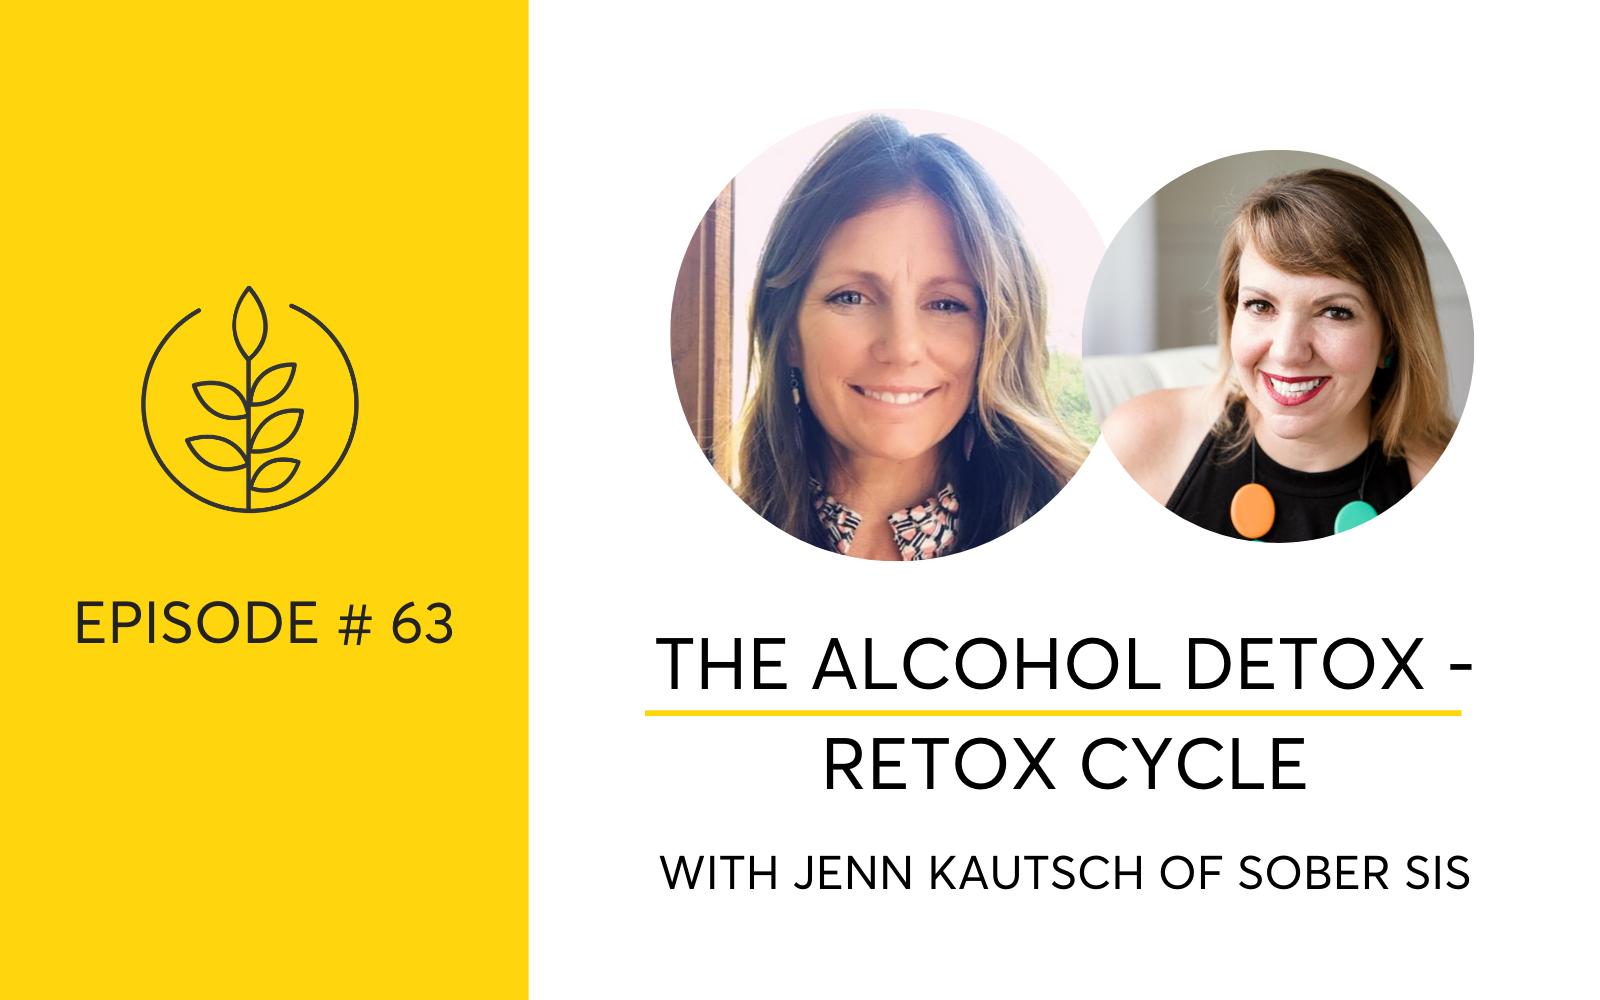 The Alcohol Detox – Retox Cycle